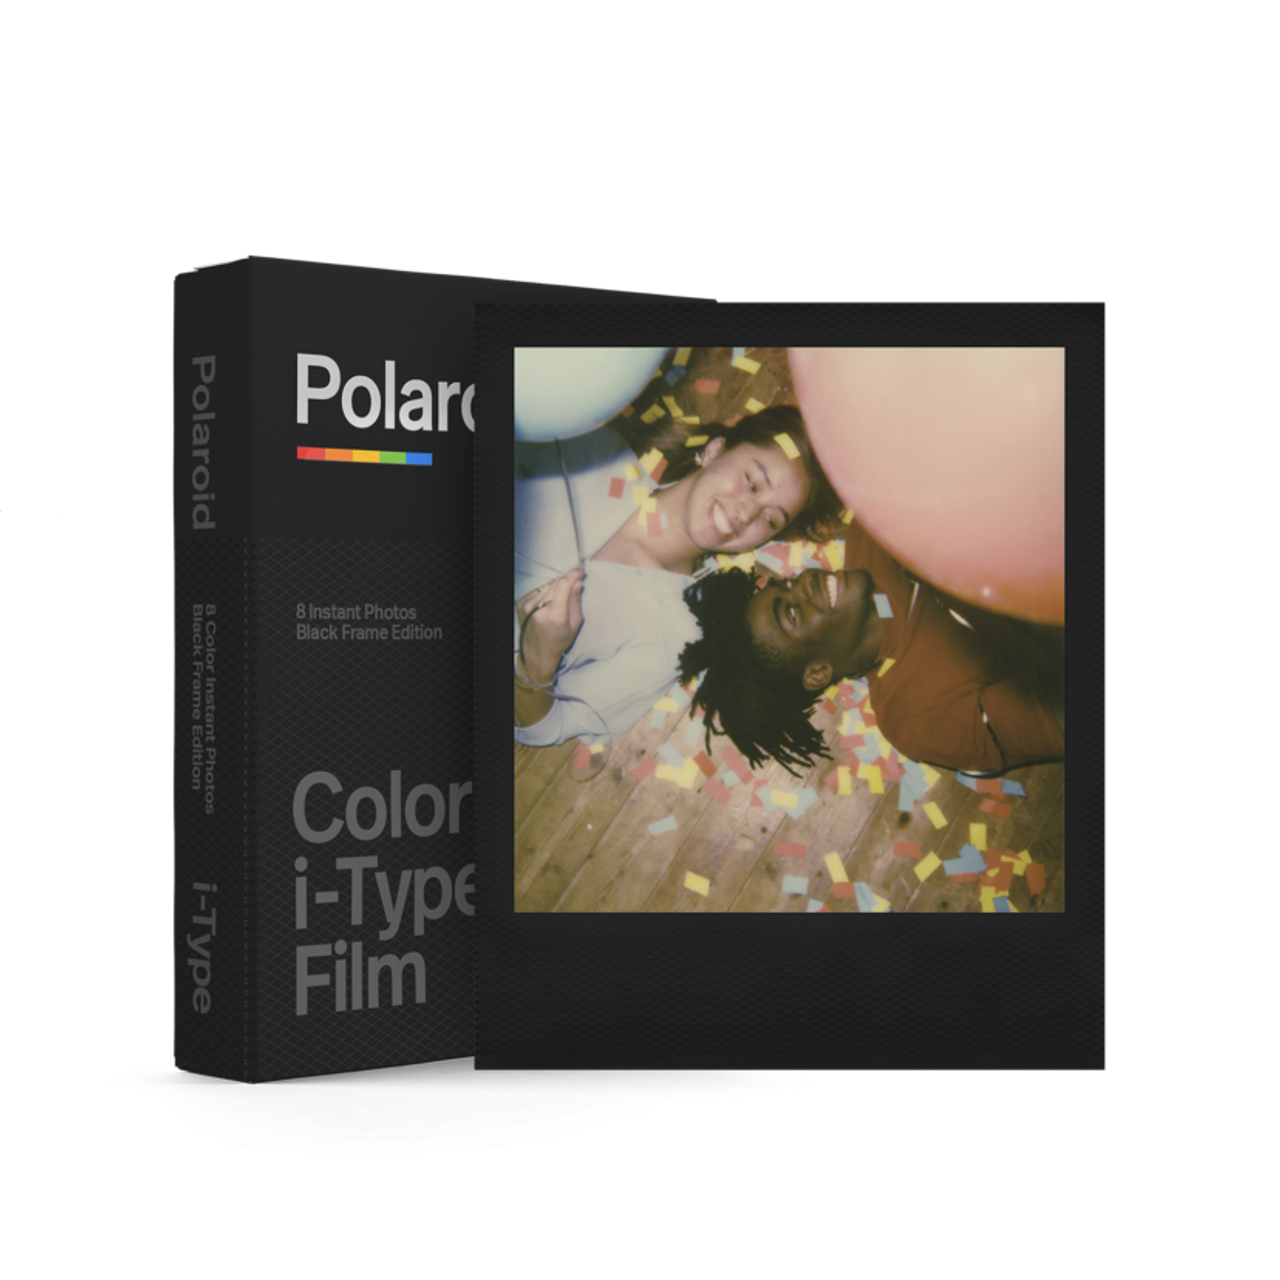 POLAROID I-TYPE FILM - COLOR W/BLACK FRAME